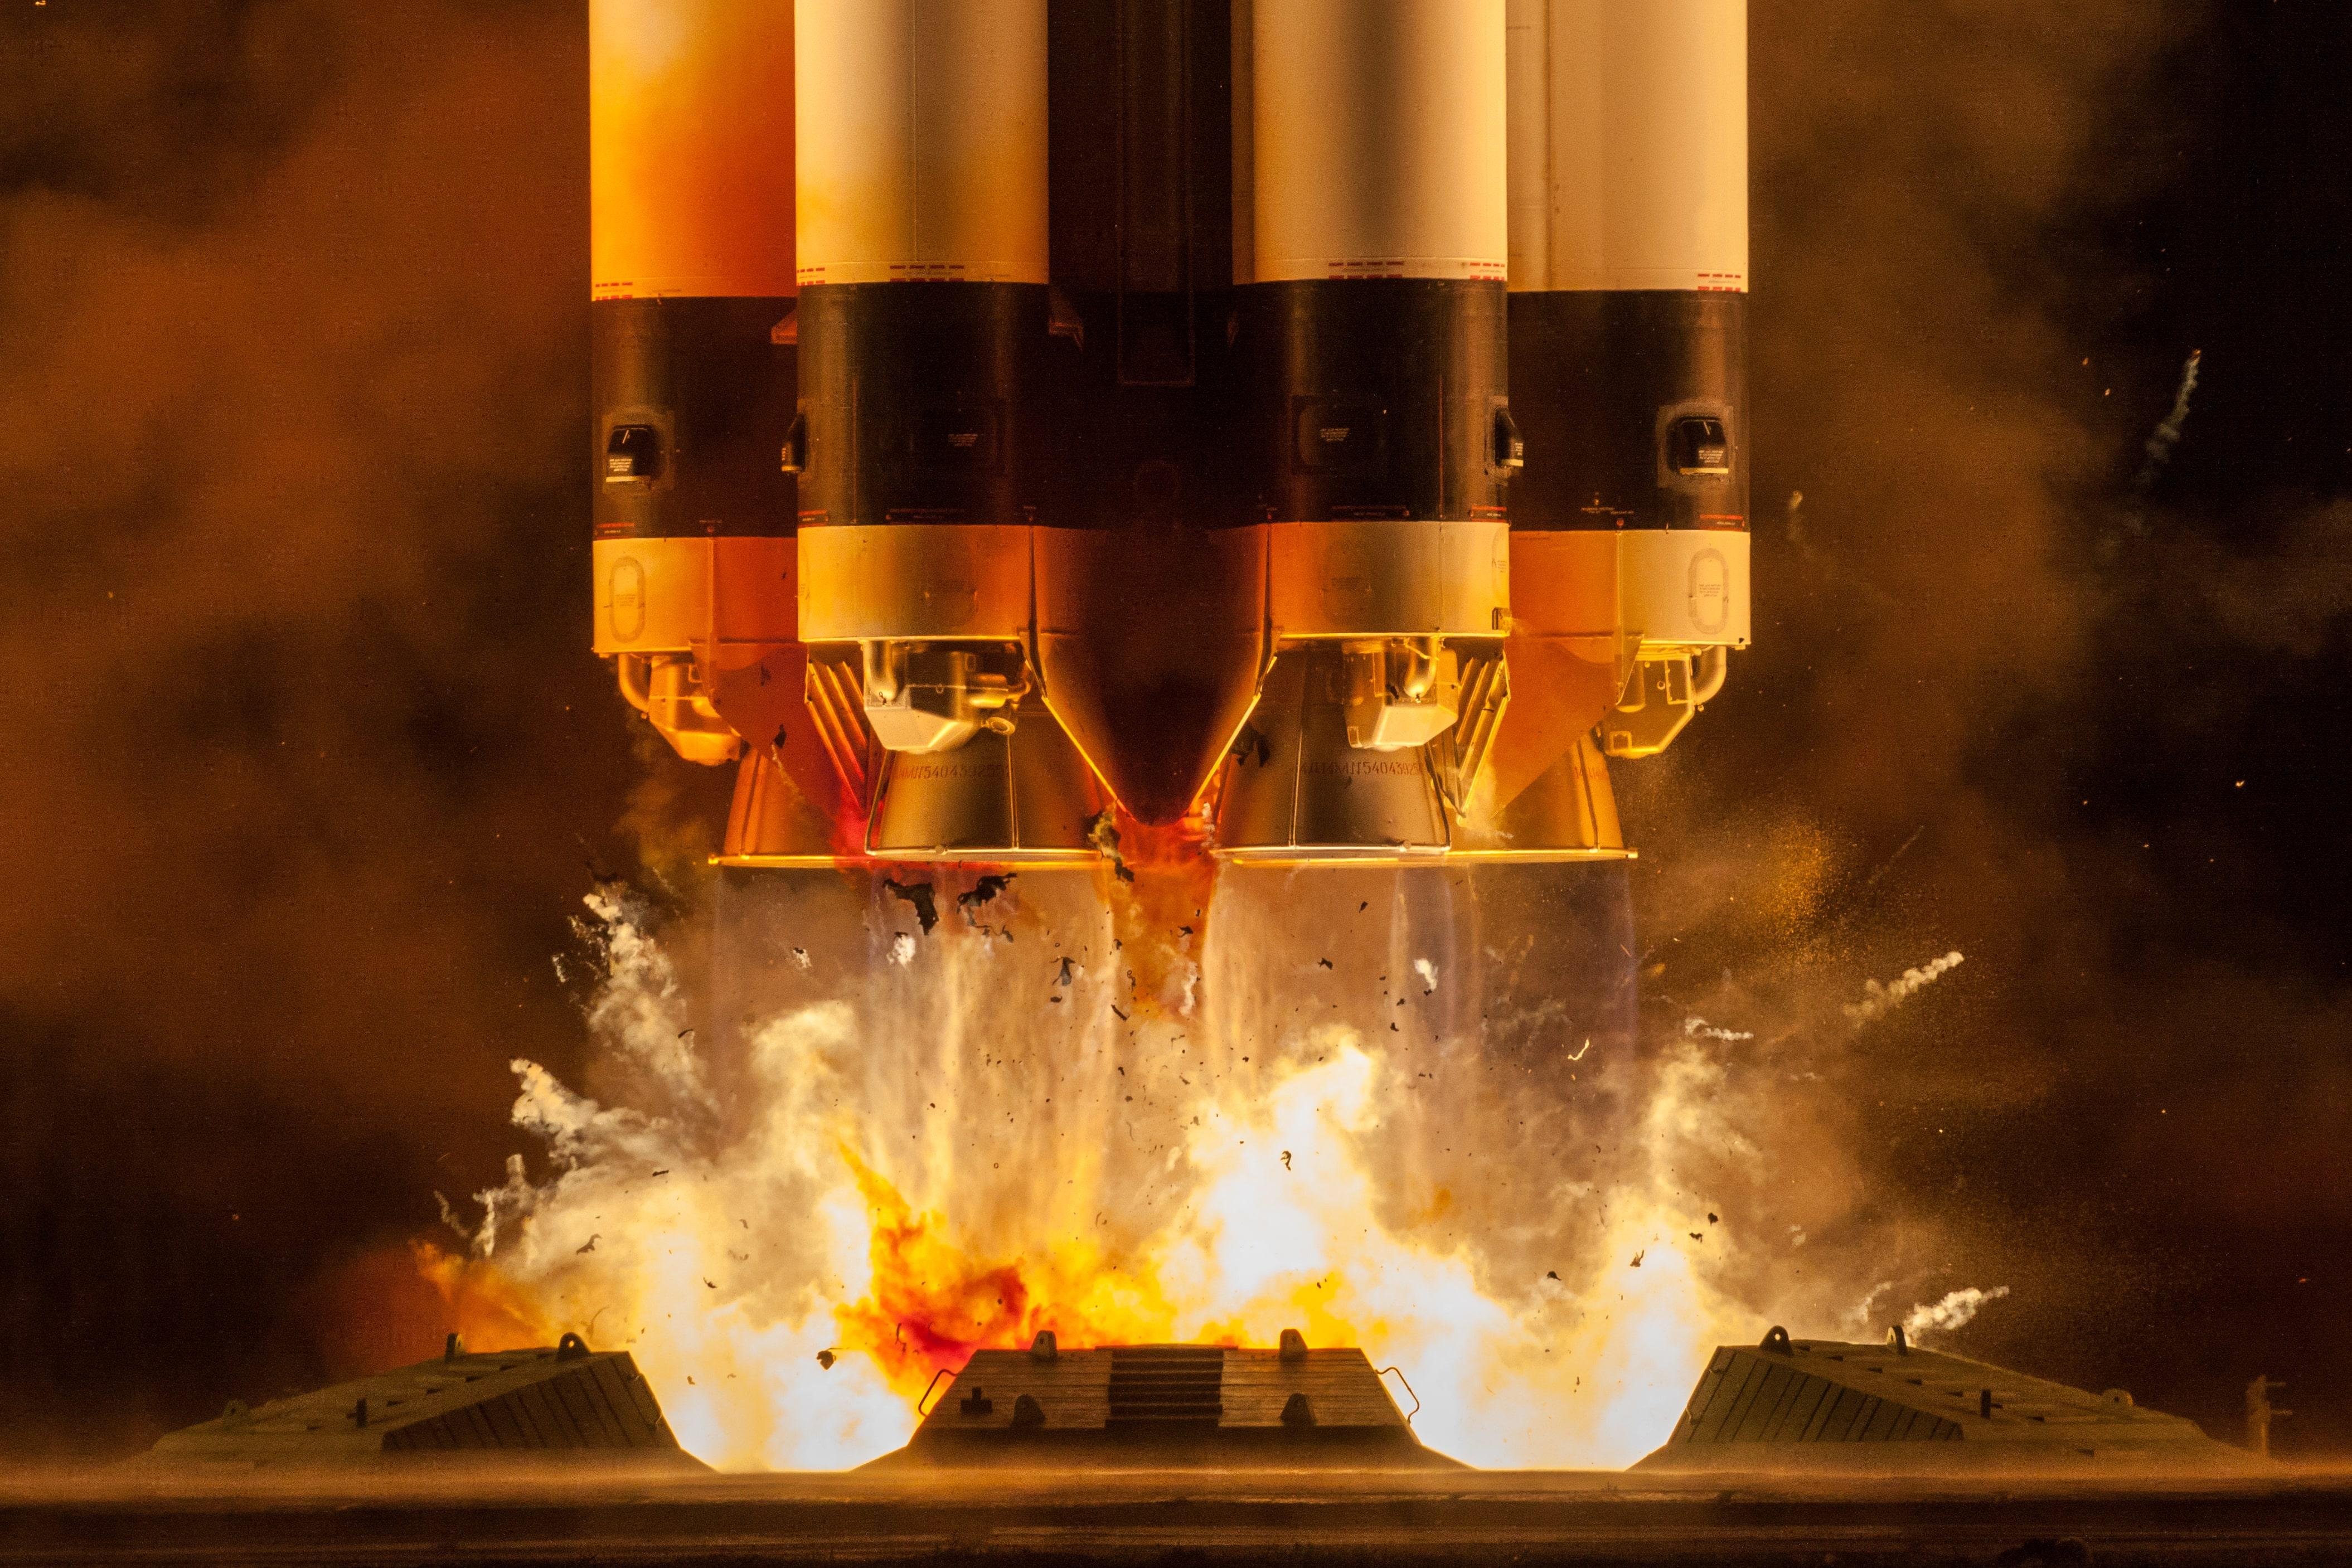 General 4219x2813 rocket launching Proton (Rocket) vehicle fire space